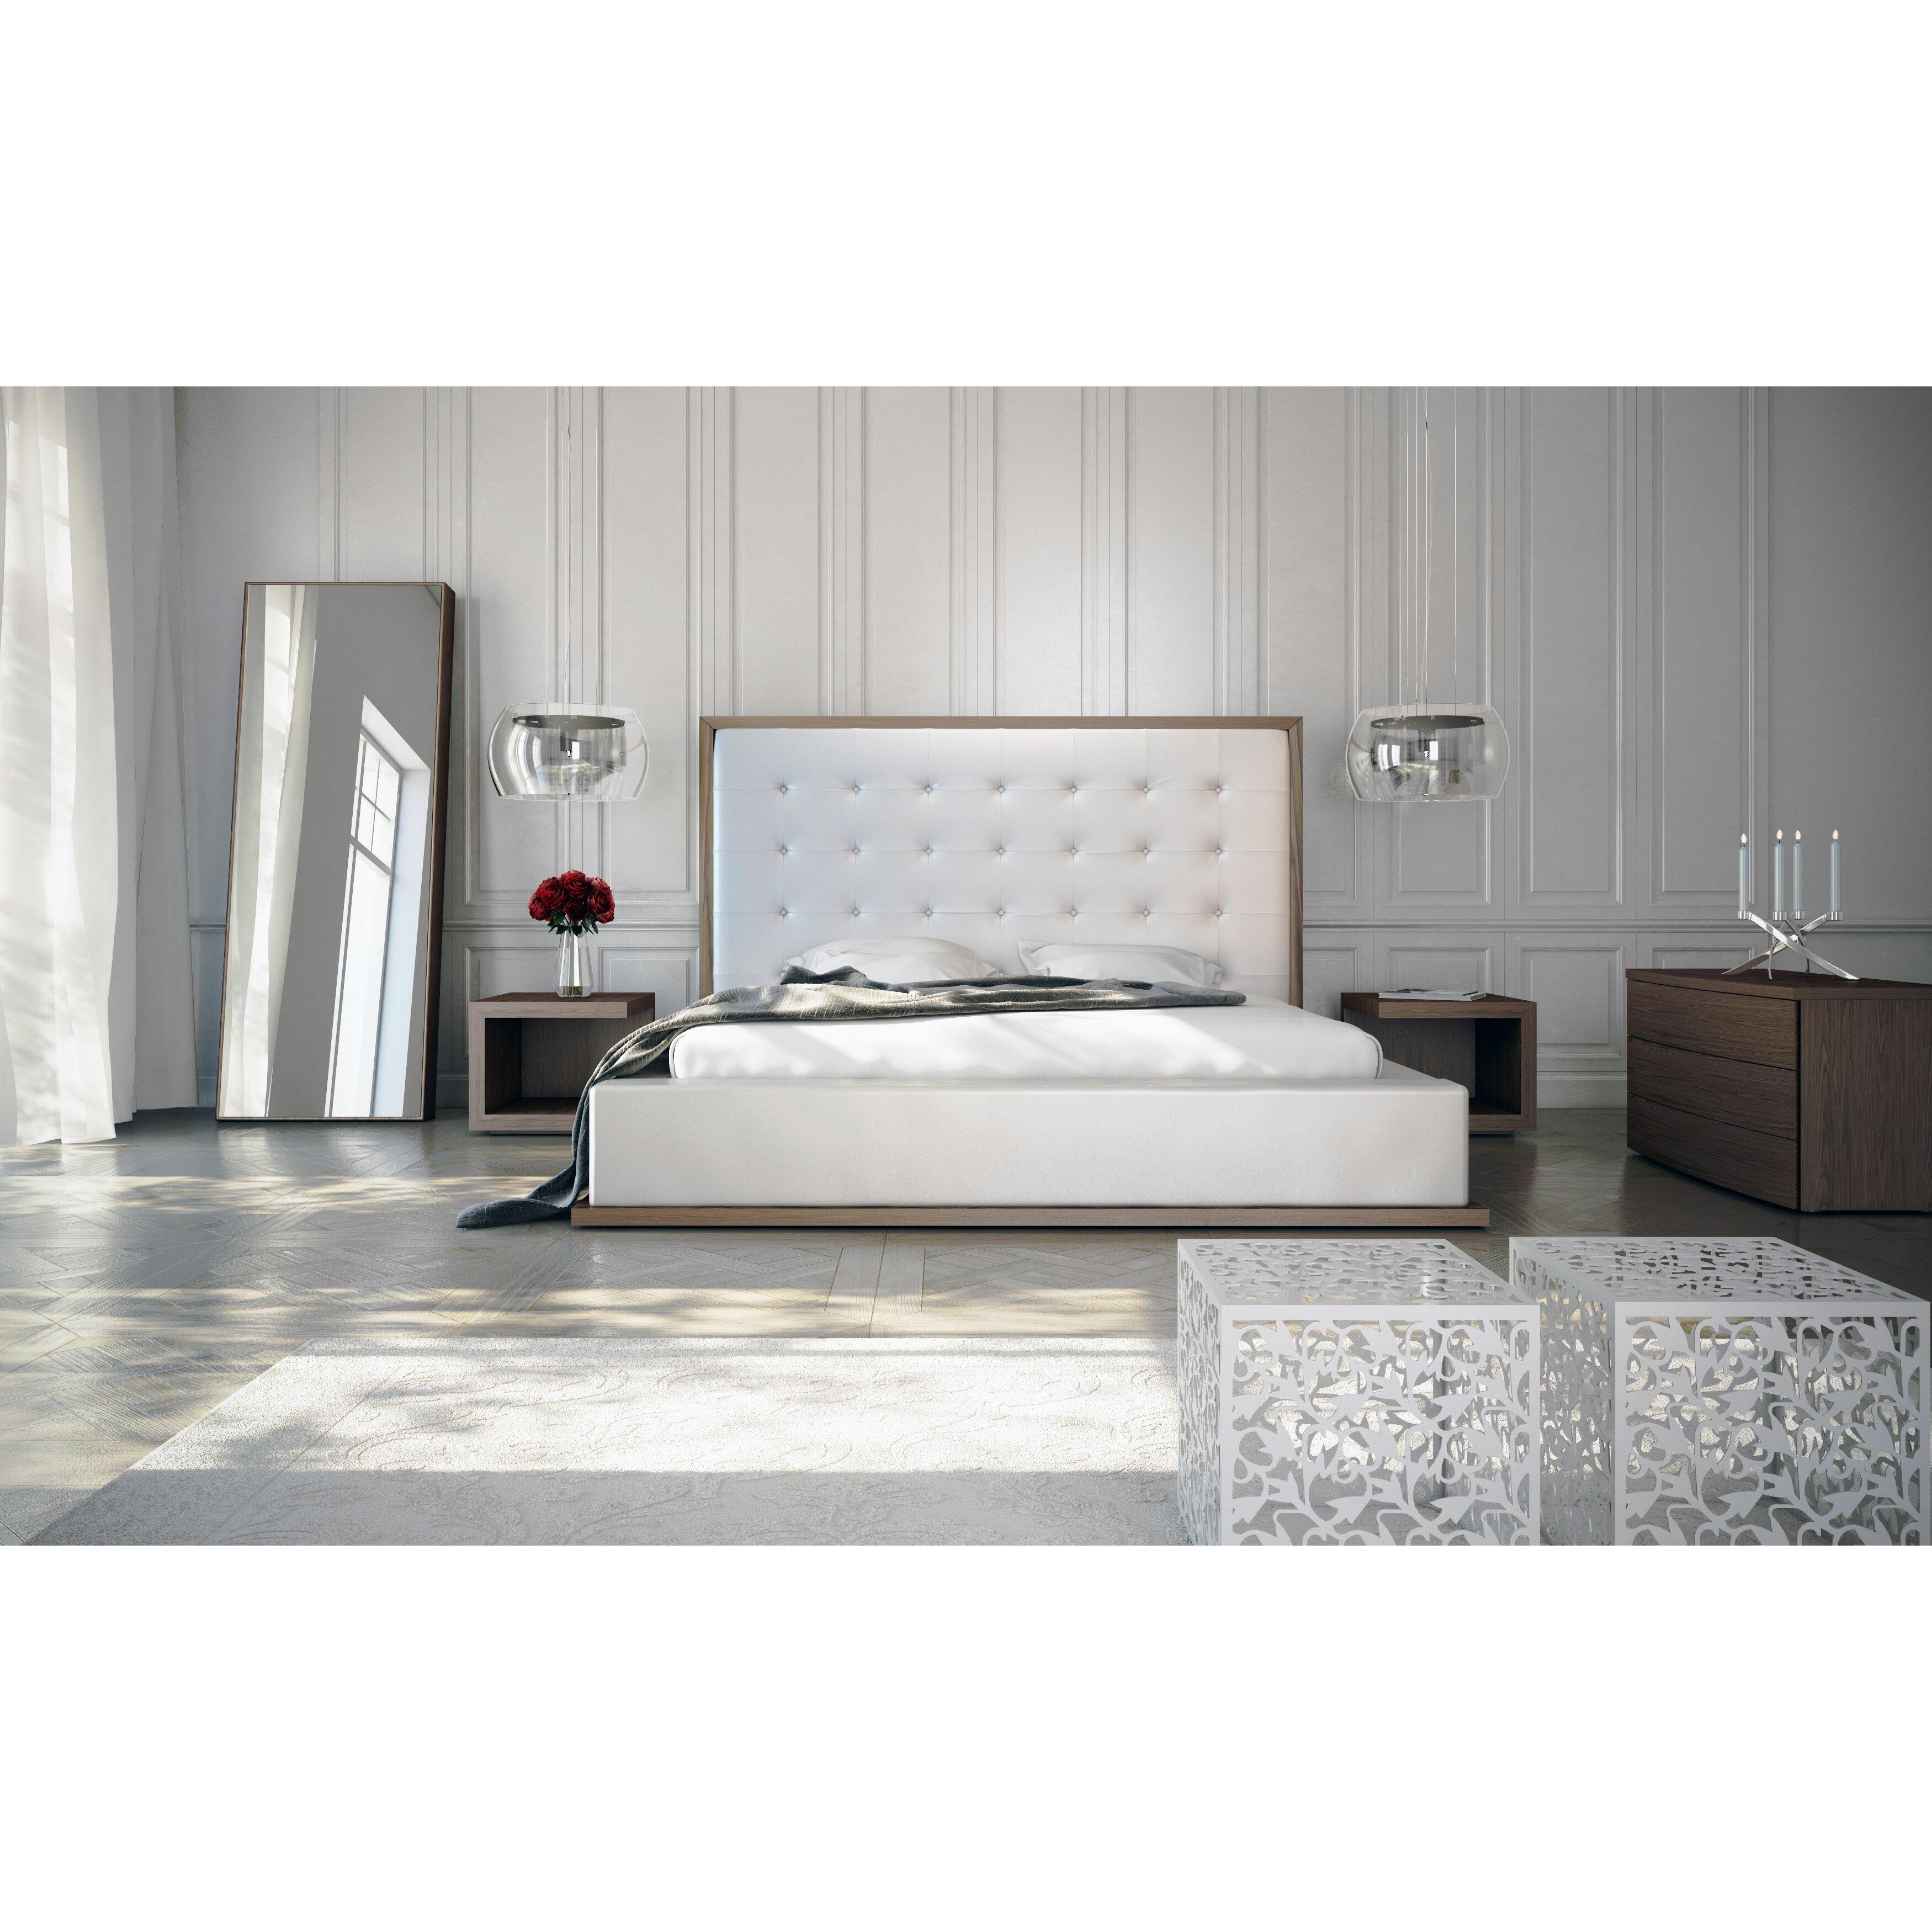 Modloft Ludlow Platform Customizable Bedroom Set. Ludlow Platform Customizable Bedroom Set   Reviews   AllModern